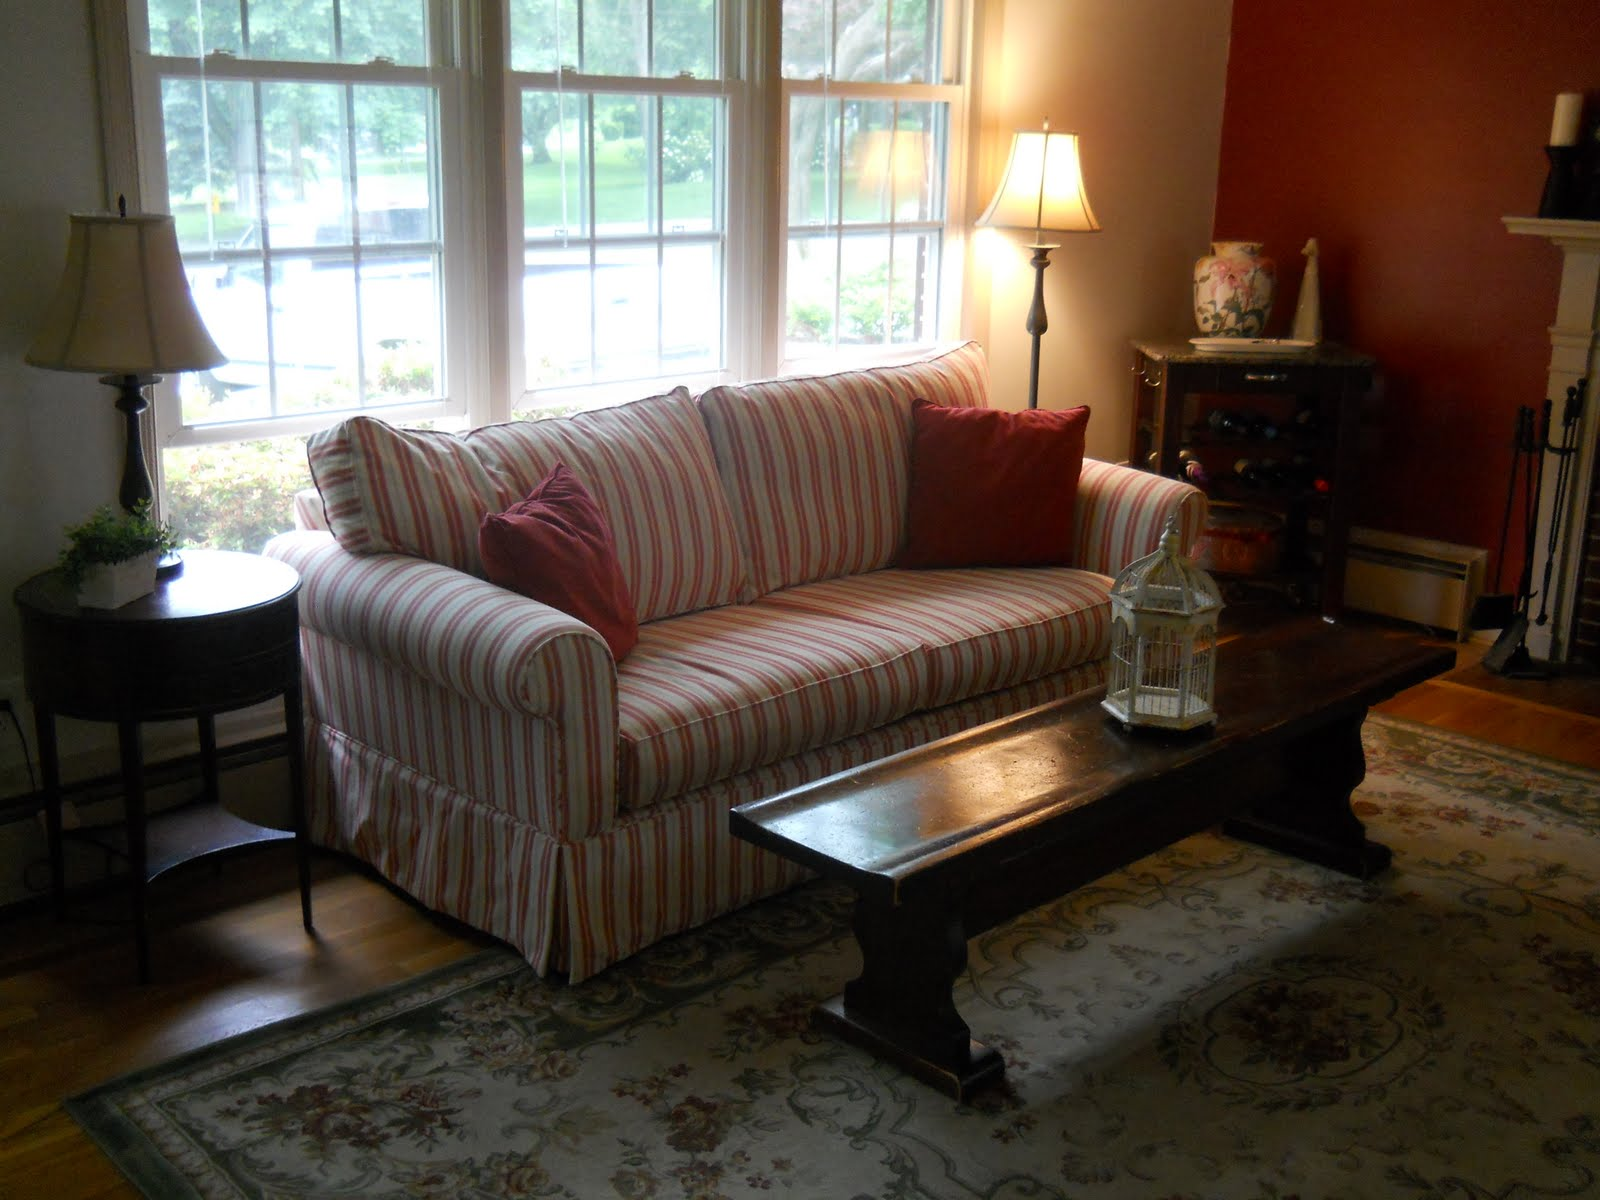 Cheap bedroom sets under 200 ideas finance sofa ashley for Oak bedroom furniture 0 finance